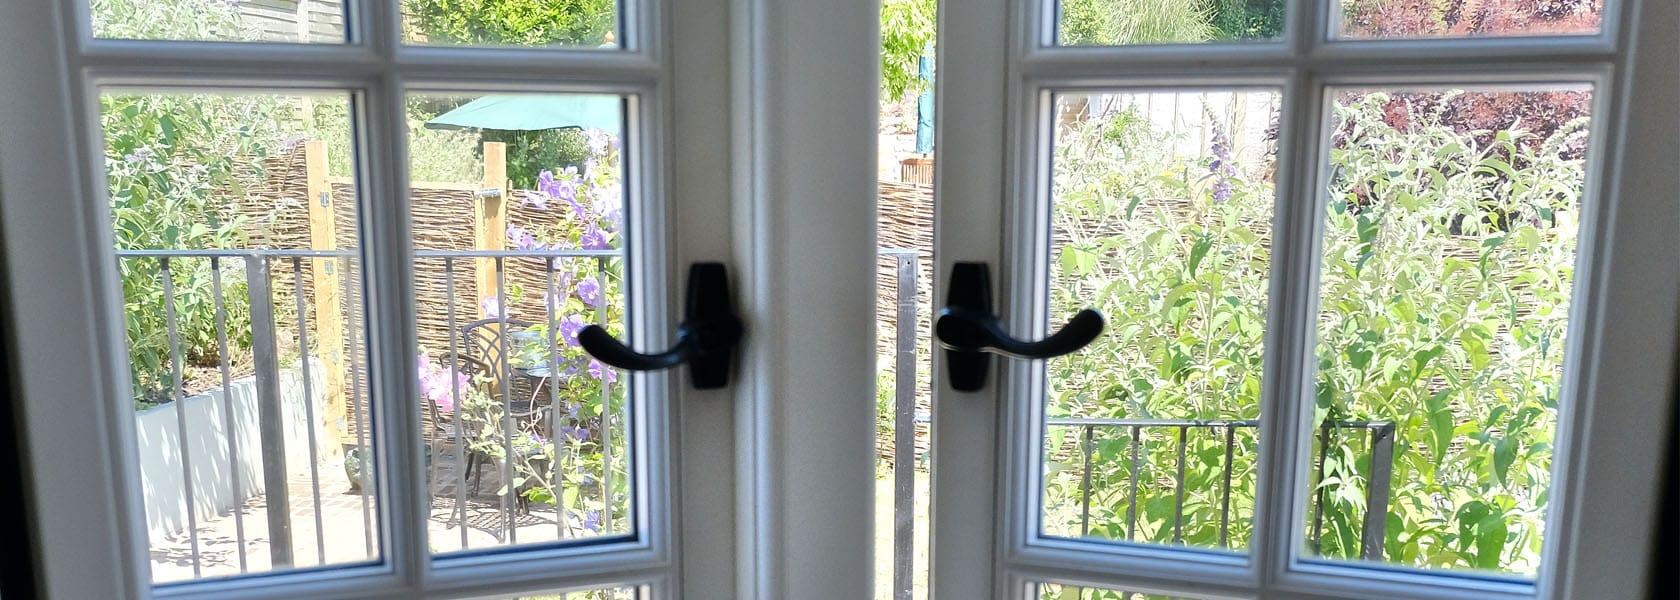 Property_StoneBarn_Windows_1680px